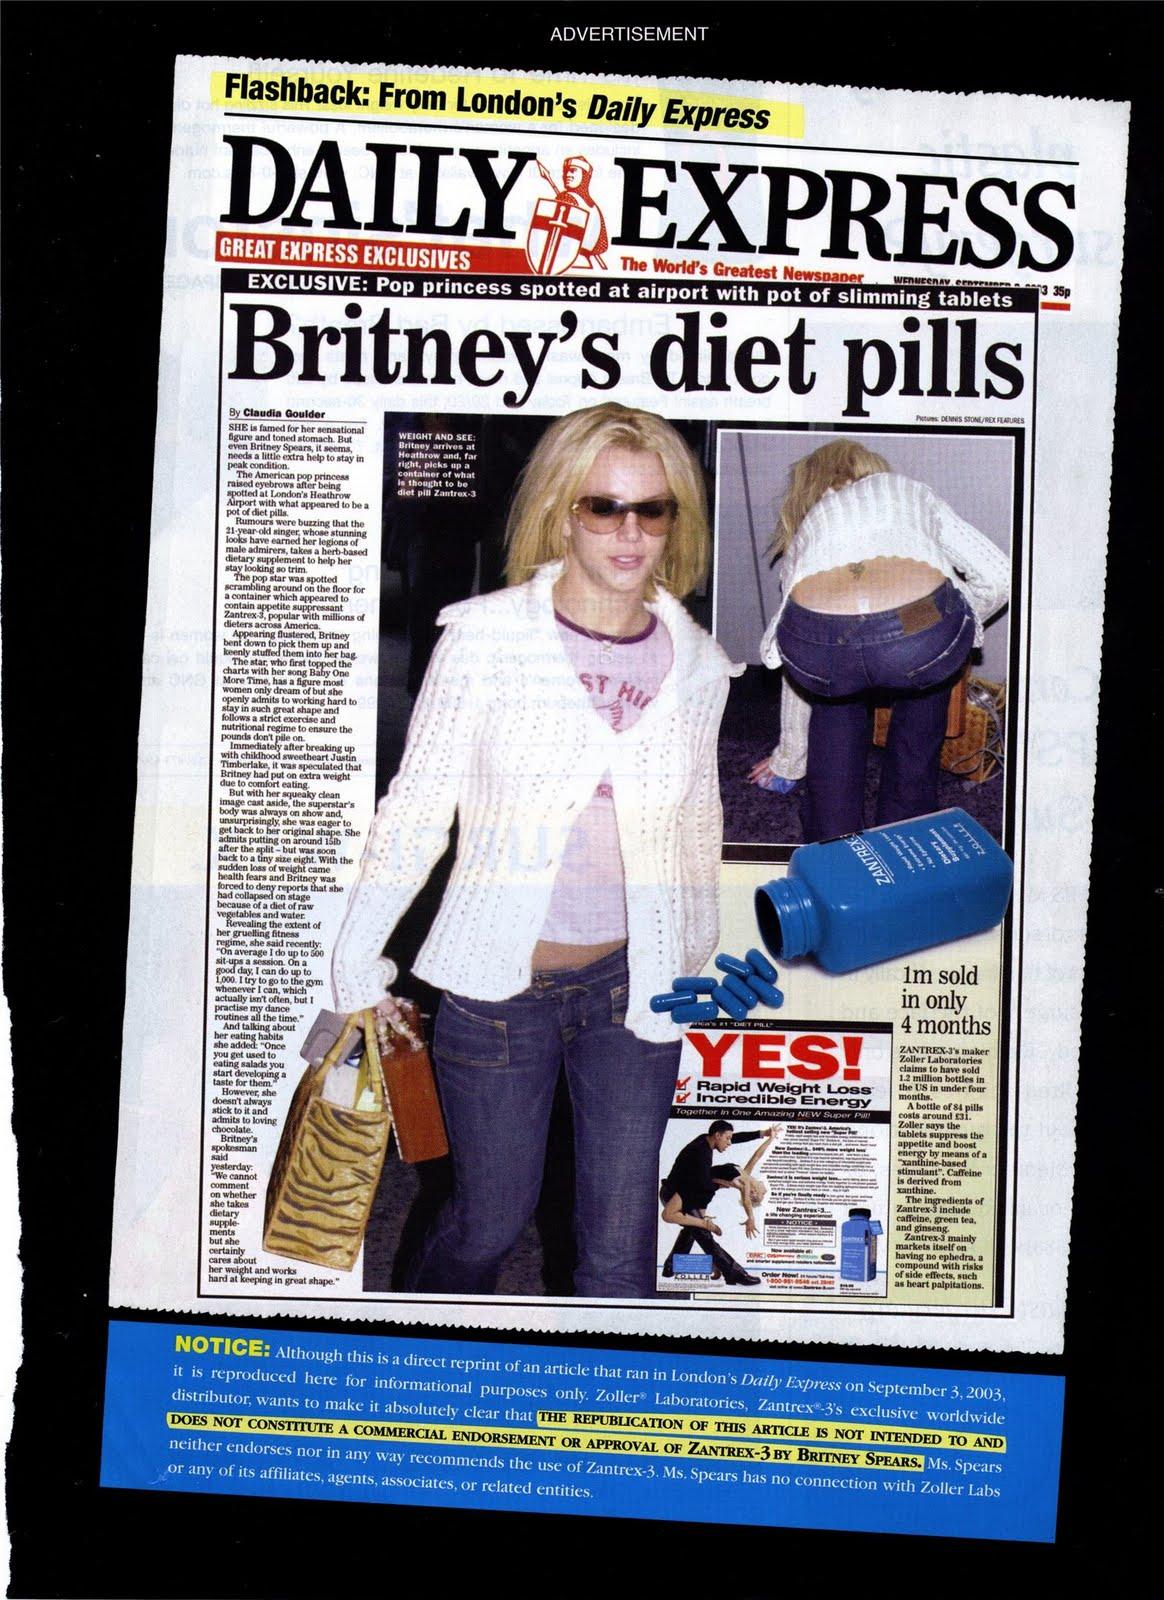 http://4.bp.blogspot.com/-ZJ9PA9XQBNg/Tm46PlooagI/AAAAAAAAC7E/ZCnwo5qEu4A/s1600/Britney+Spears+Ad+13.jpg